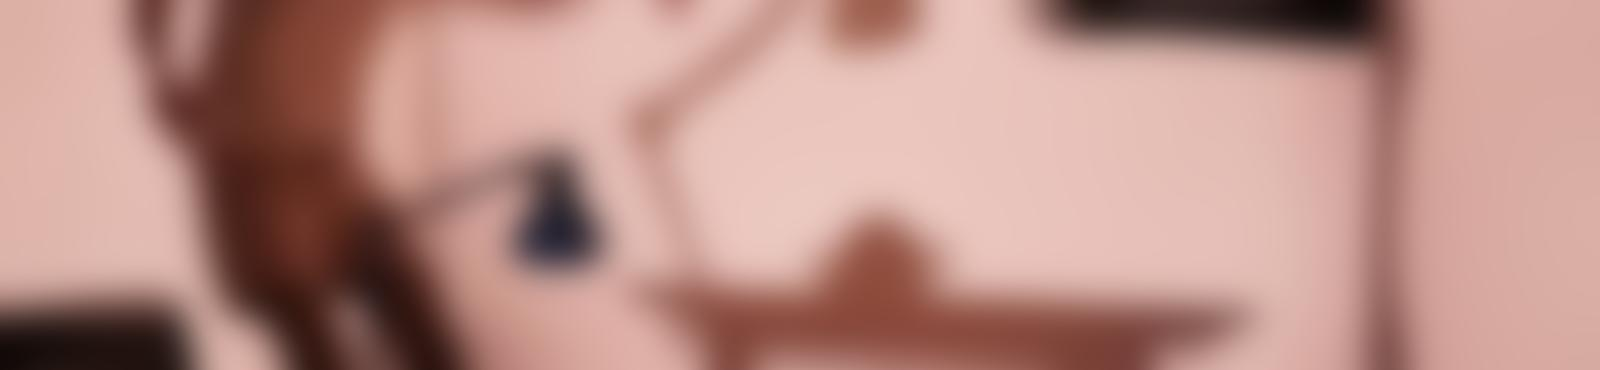 Blurred e0e40a67 68bc 494e bef3 cf25514a49b6